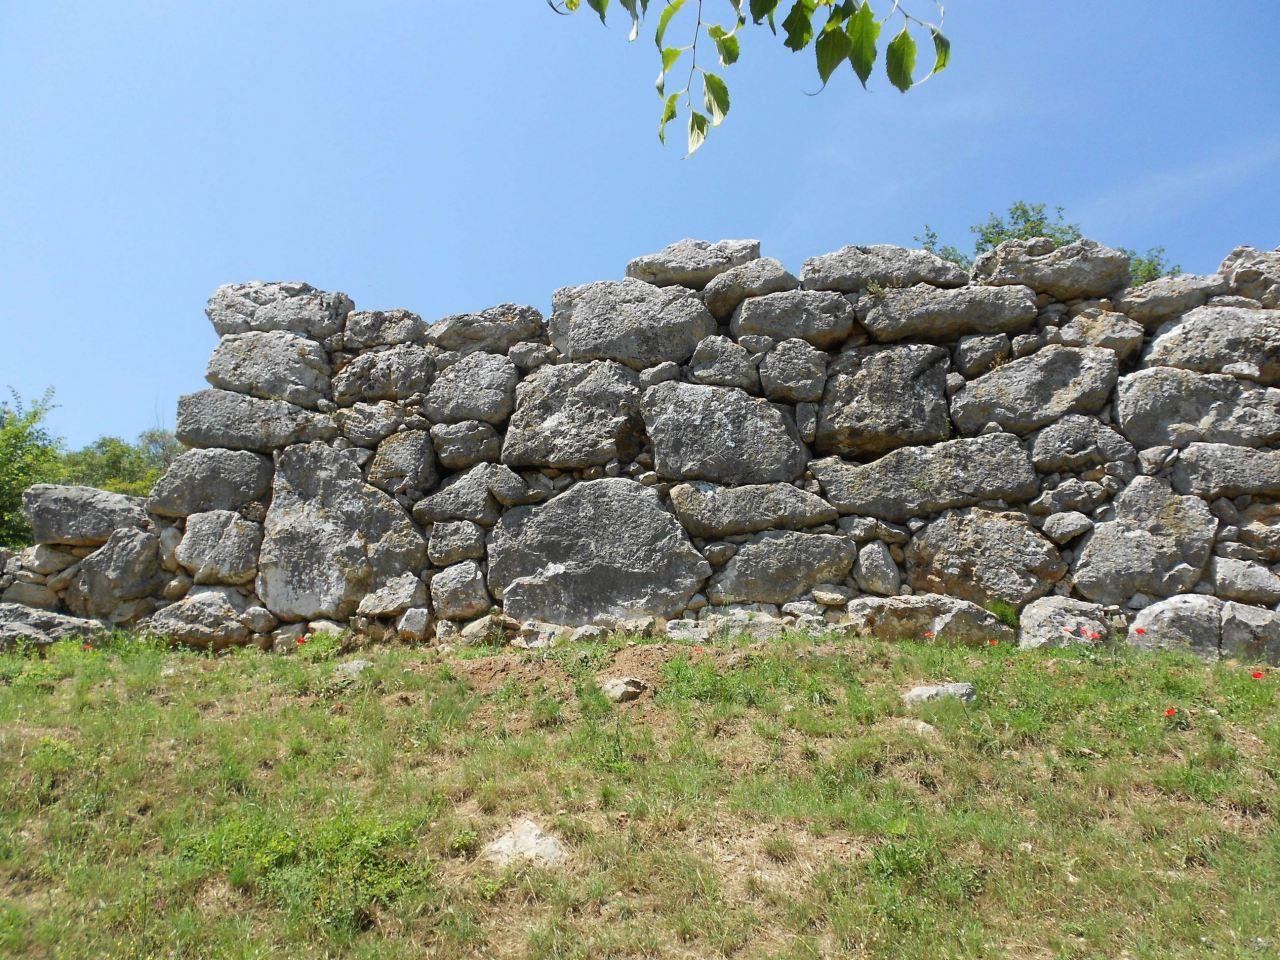 Roselle-Mura-Megalitiche-Roselle-Grosseto-Toscana-Italia-42